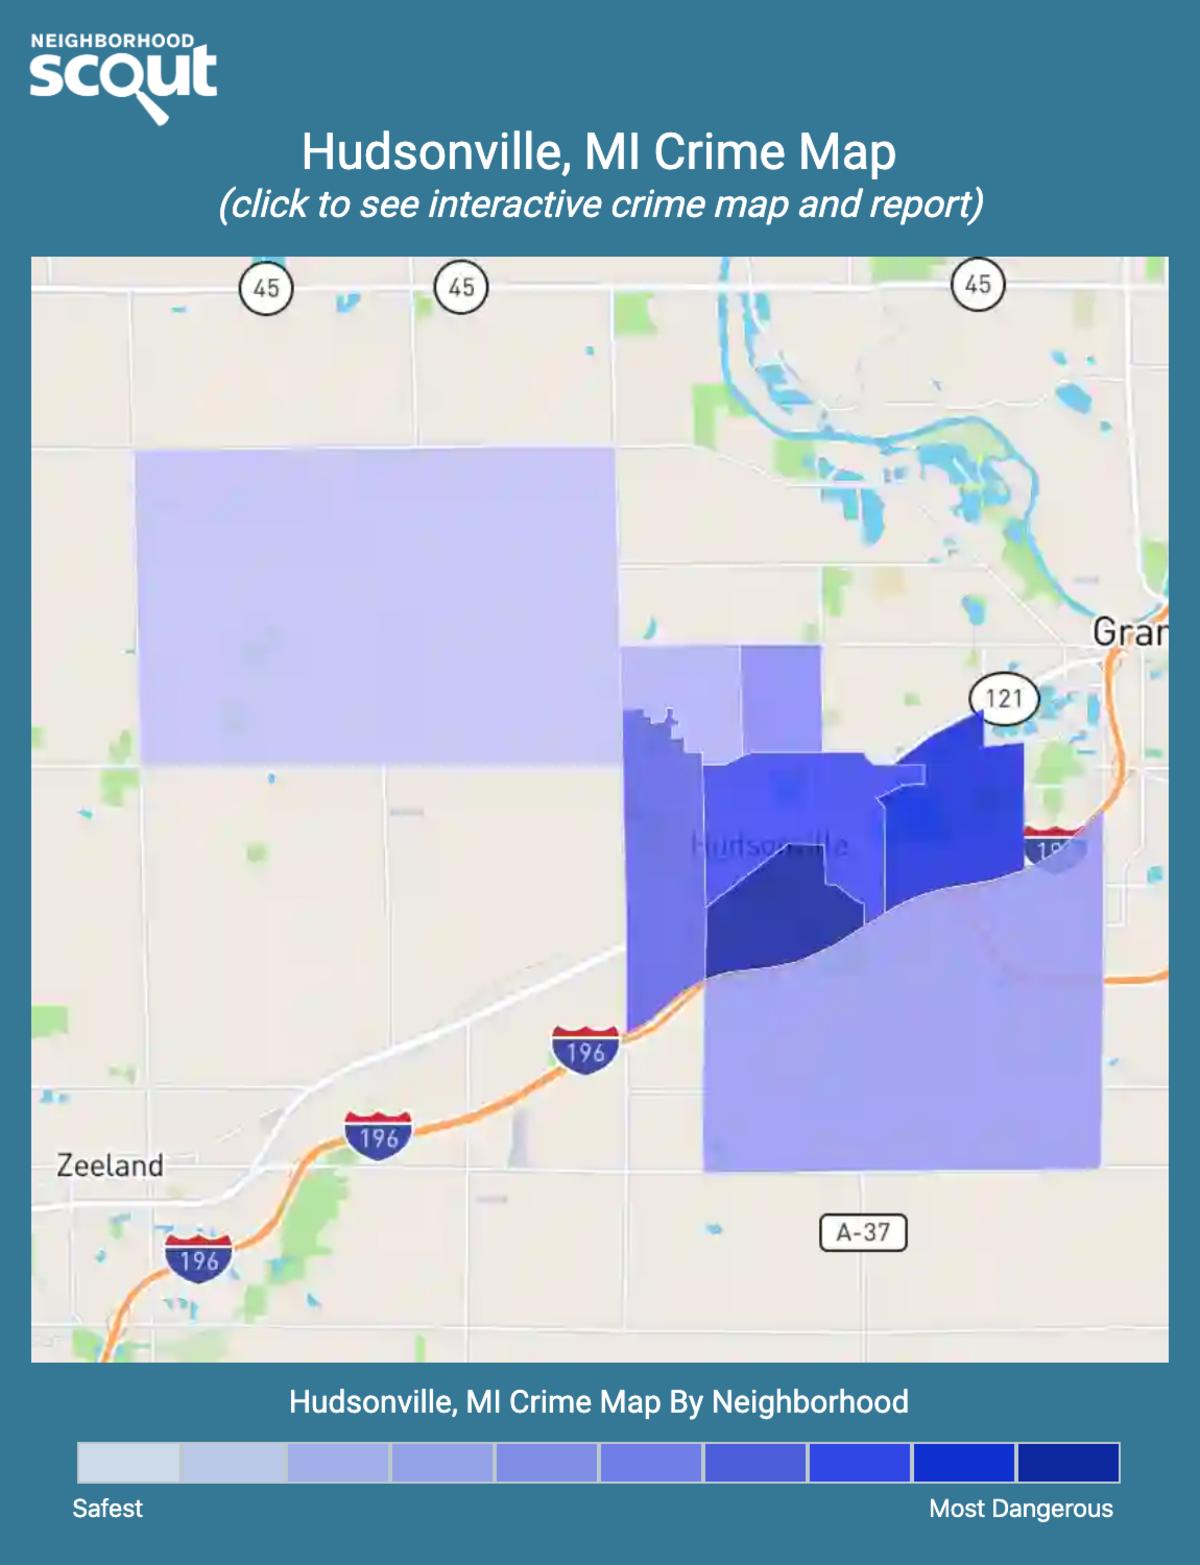 Hudsonville, Michigan crime map